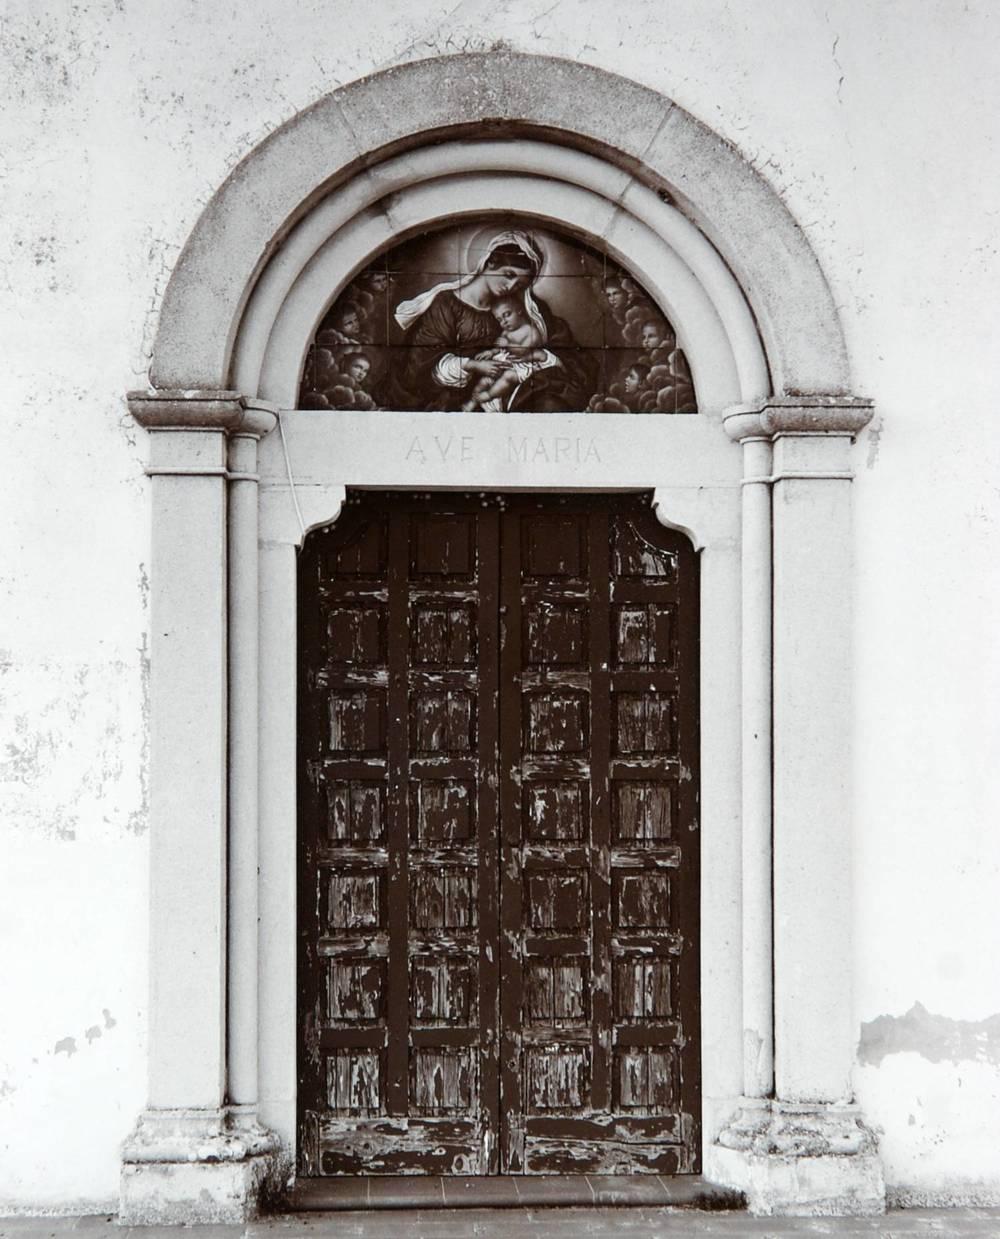 Cemetery Chapel (Le Marche, Italy)